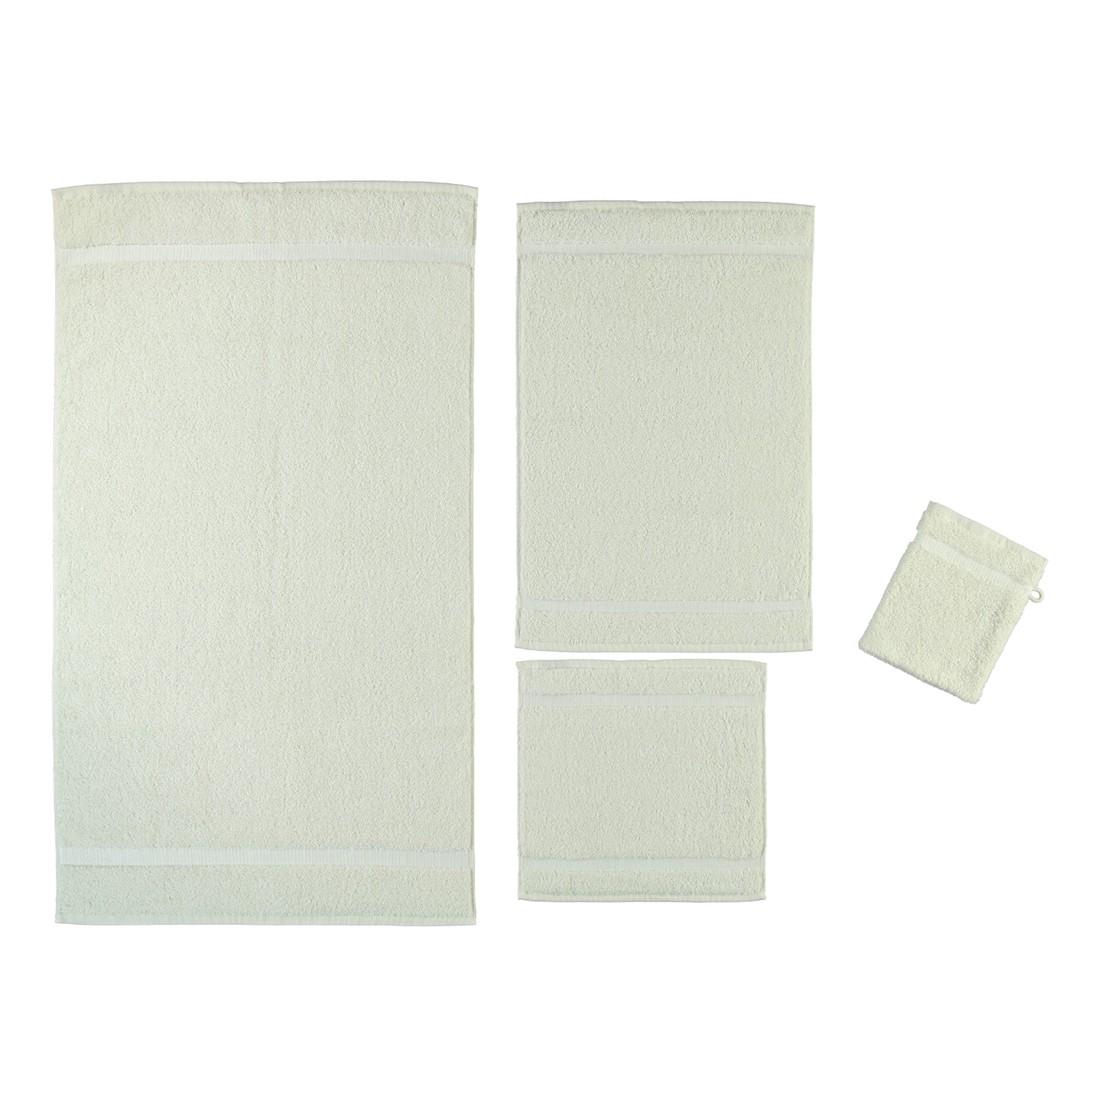 Handtuch Princess – 100% Baumwolle ecru – 260 – Duschtuch: 70 x 130 cm, Rhomtuft günstig bestellen